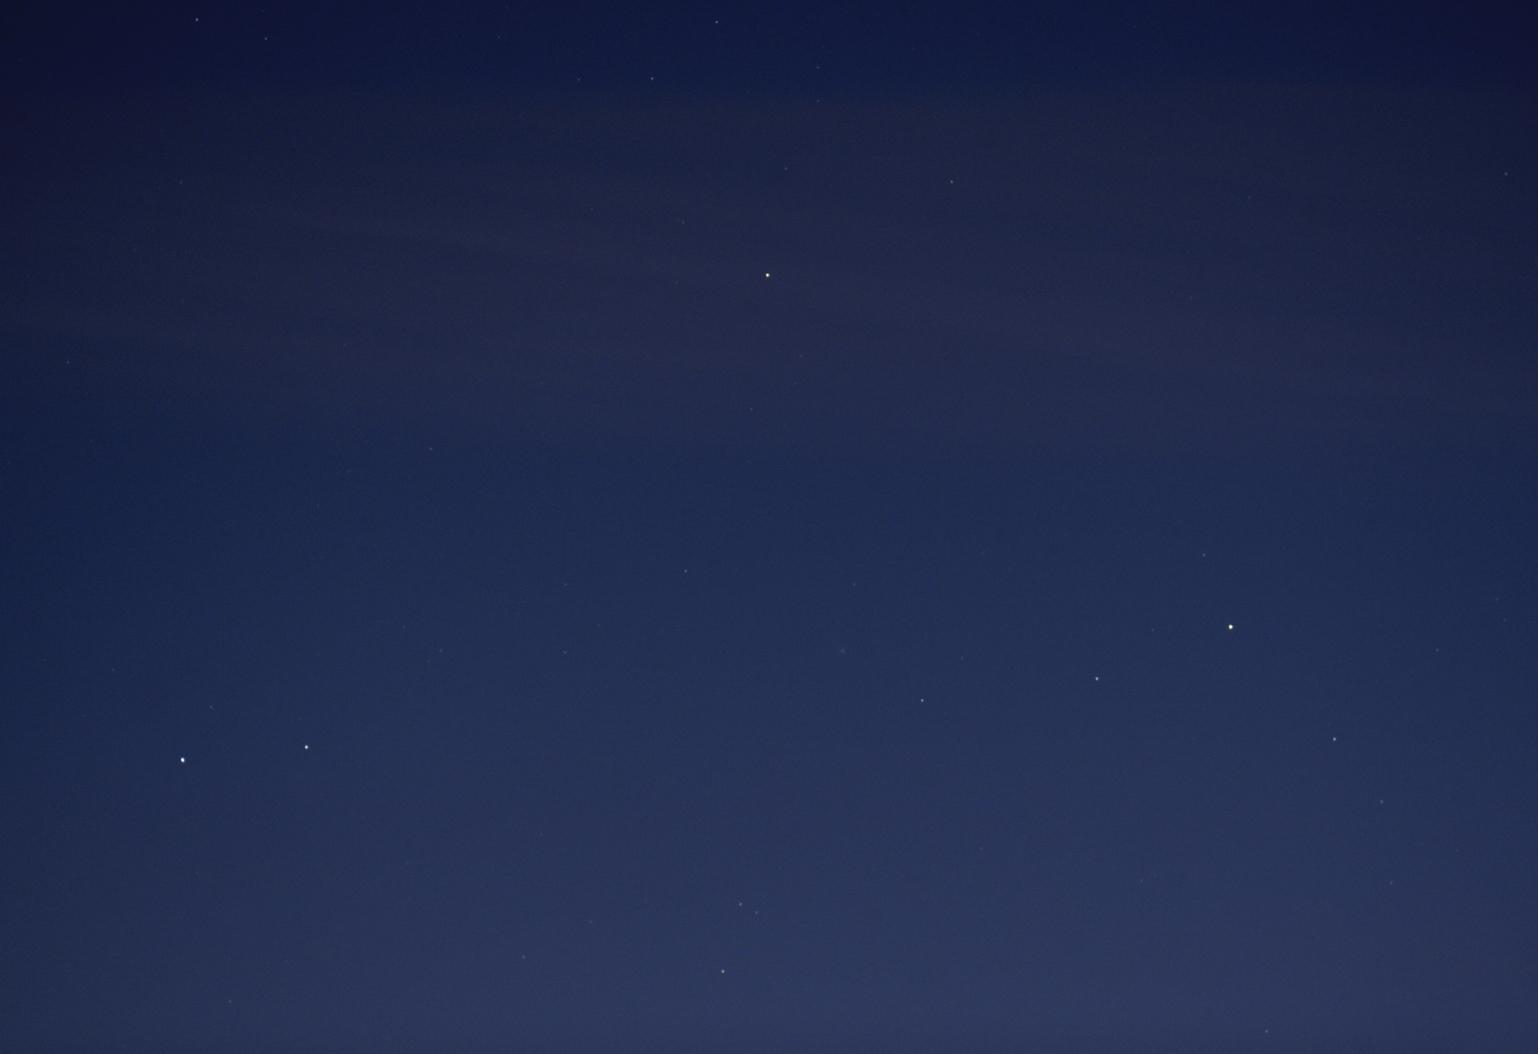 Pole s kometou 96P/Machholz v ED80/600 při f402 mm, Martin Gembec